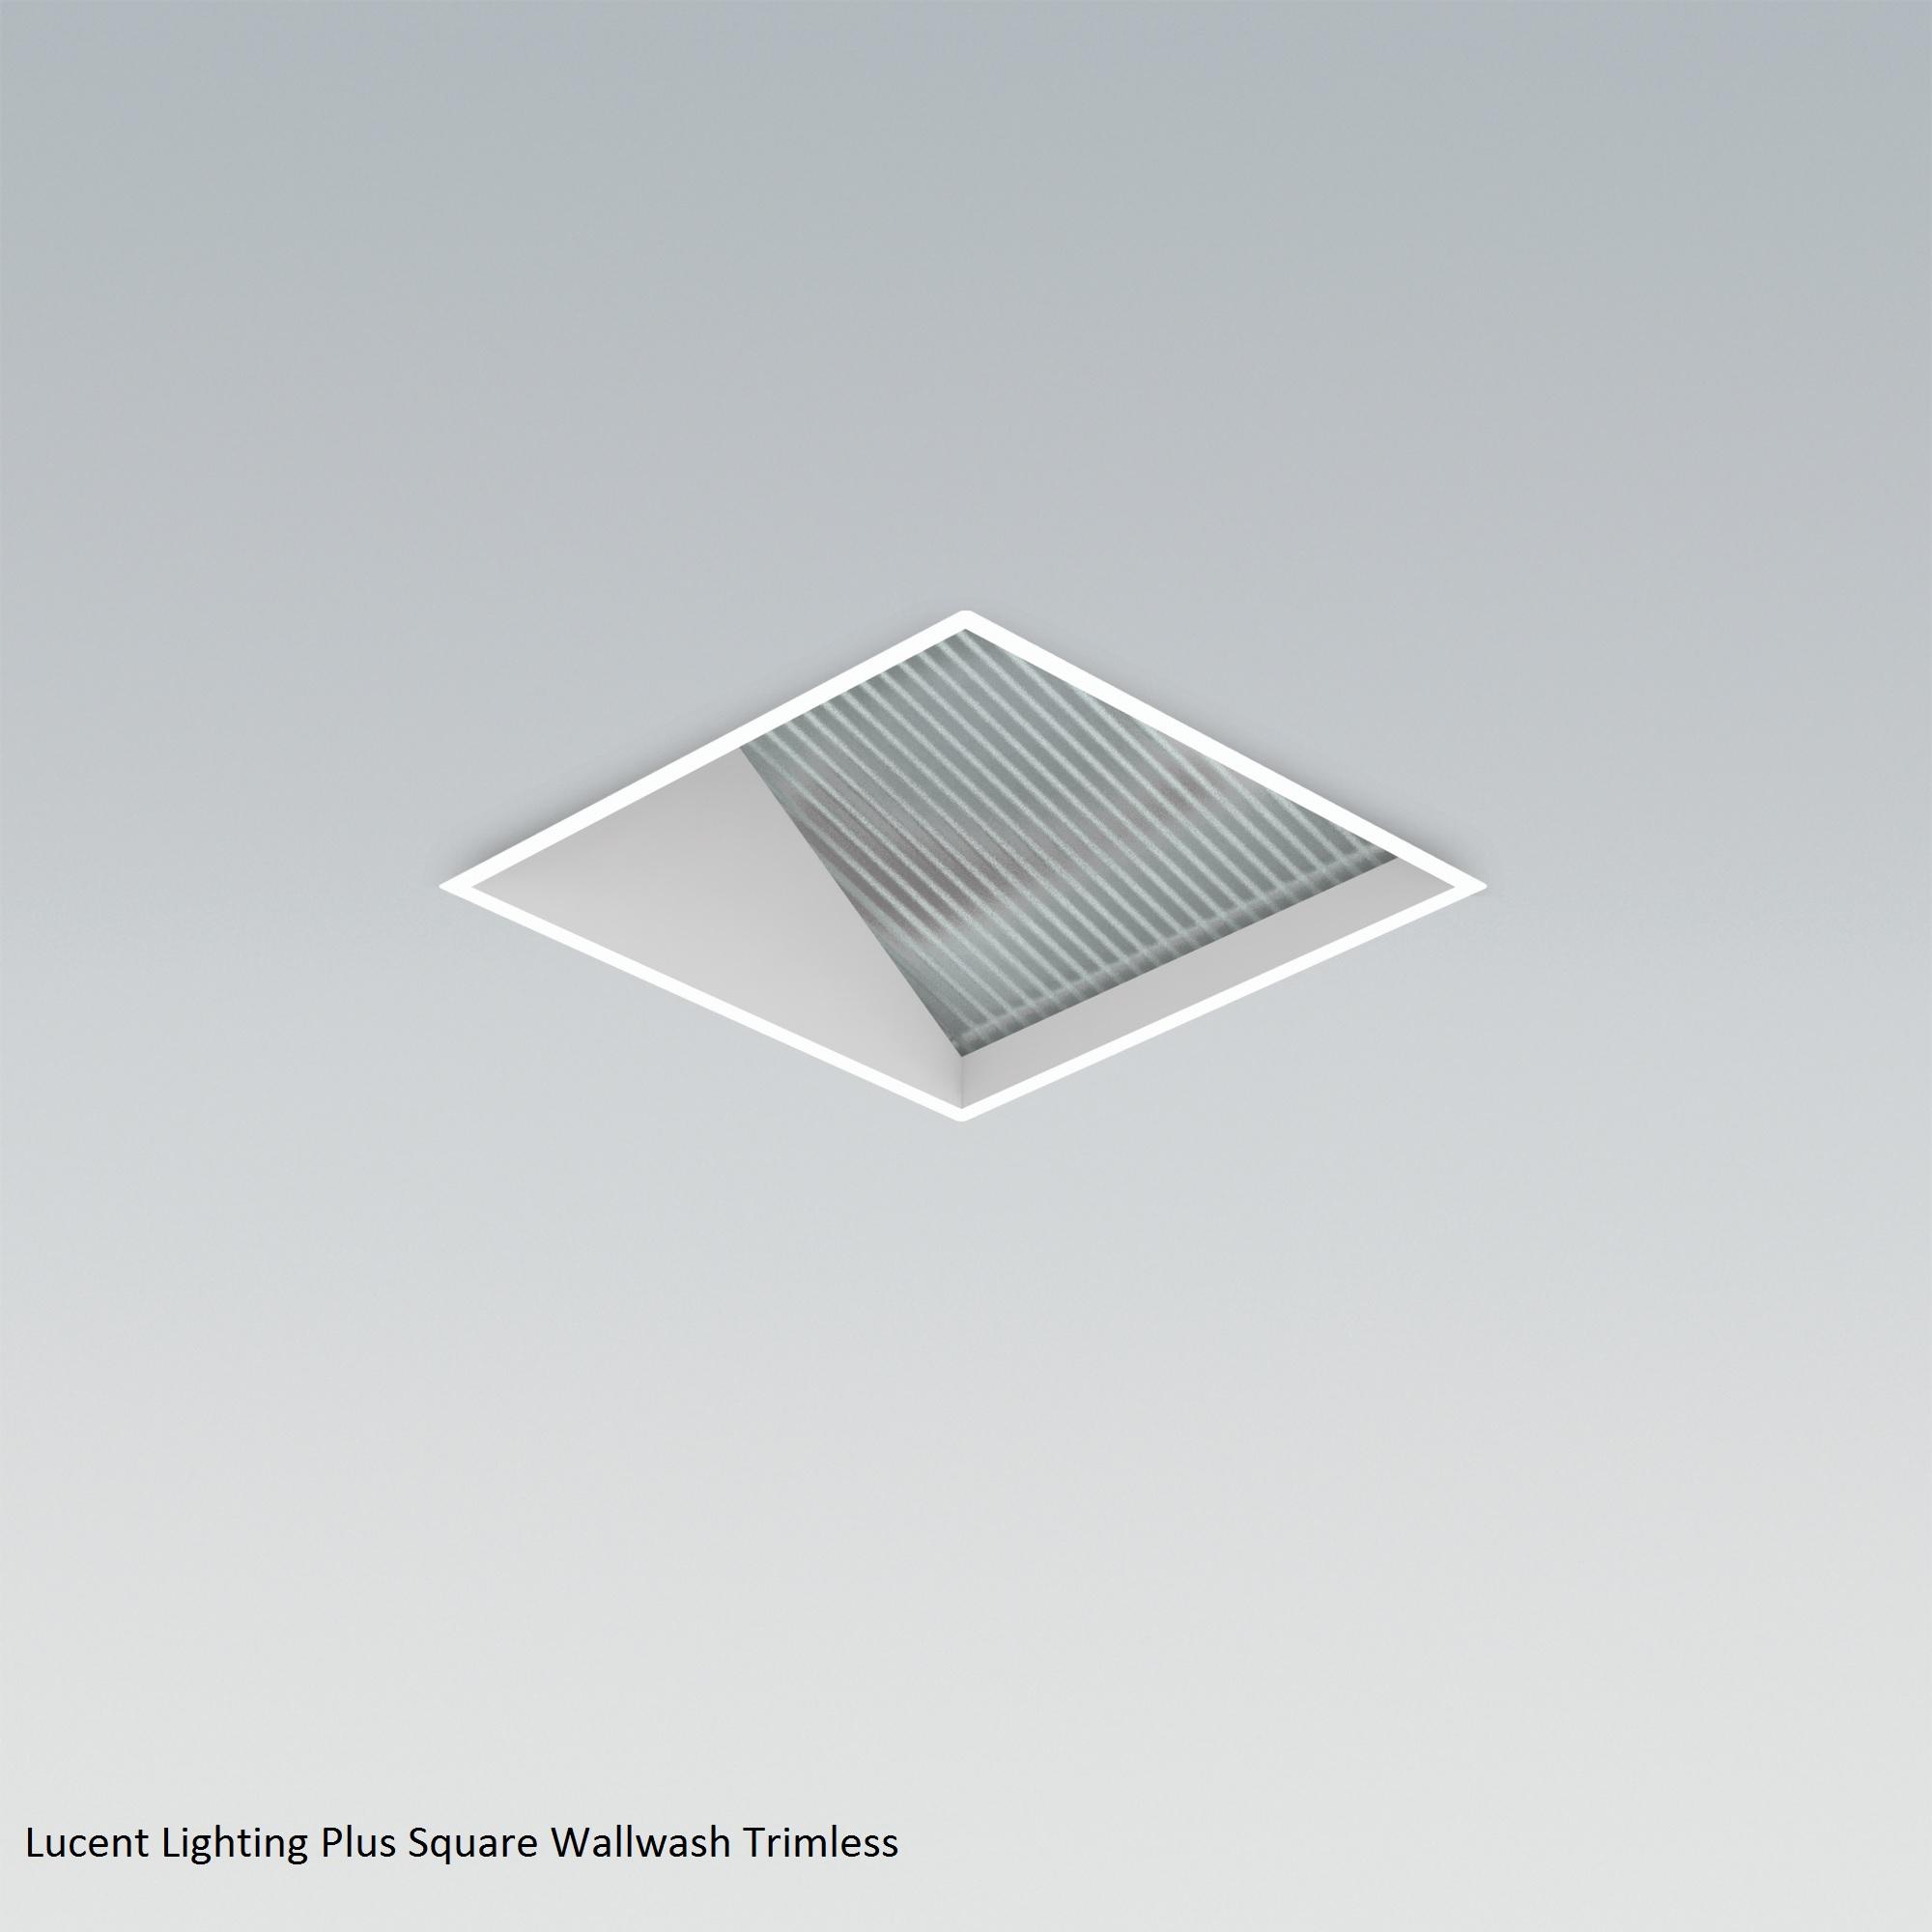 lucent-lighting-plus-square-wallwash-trimless1520328501